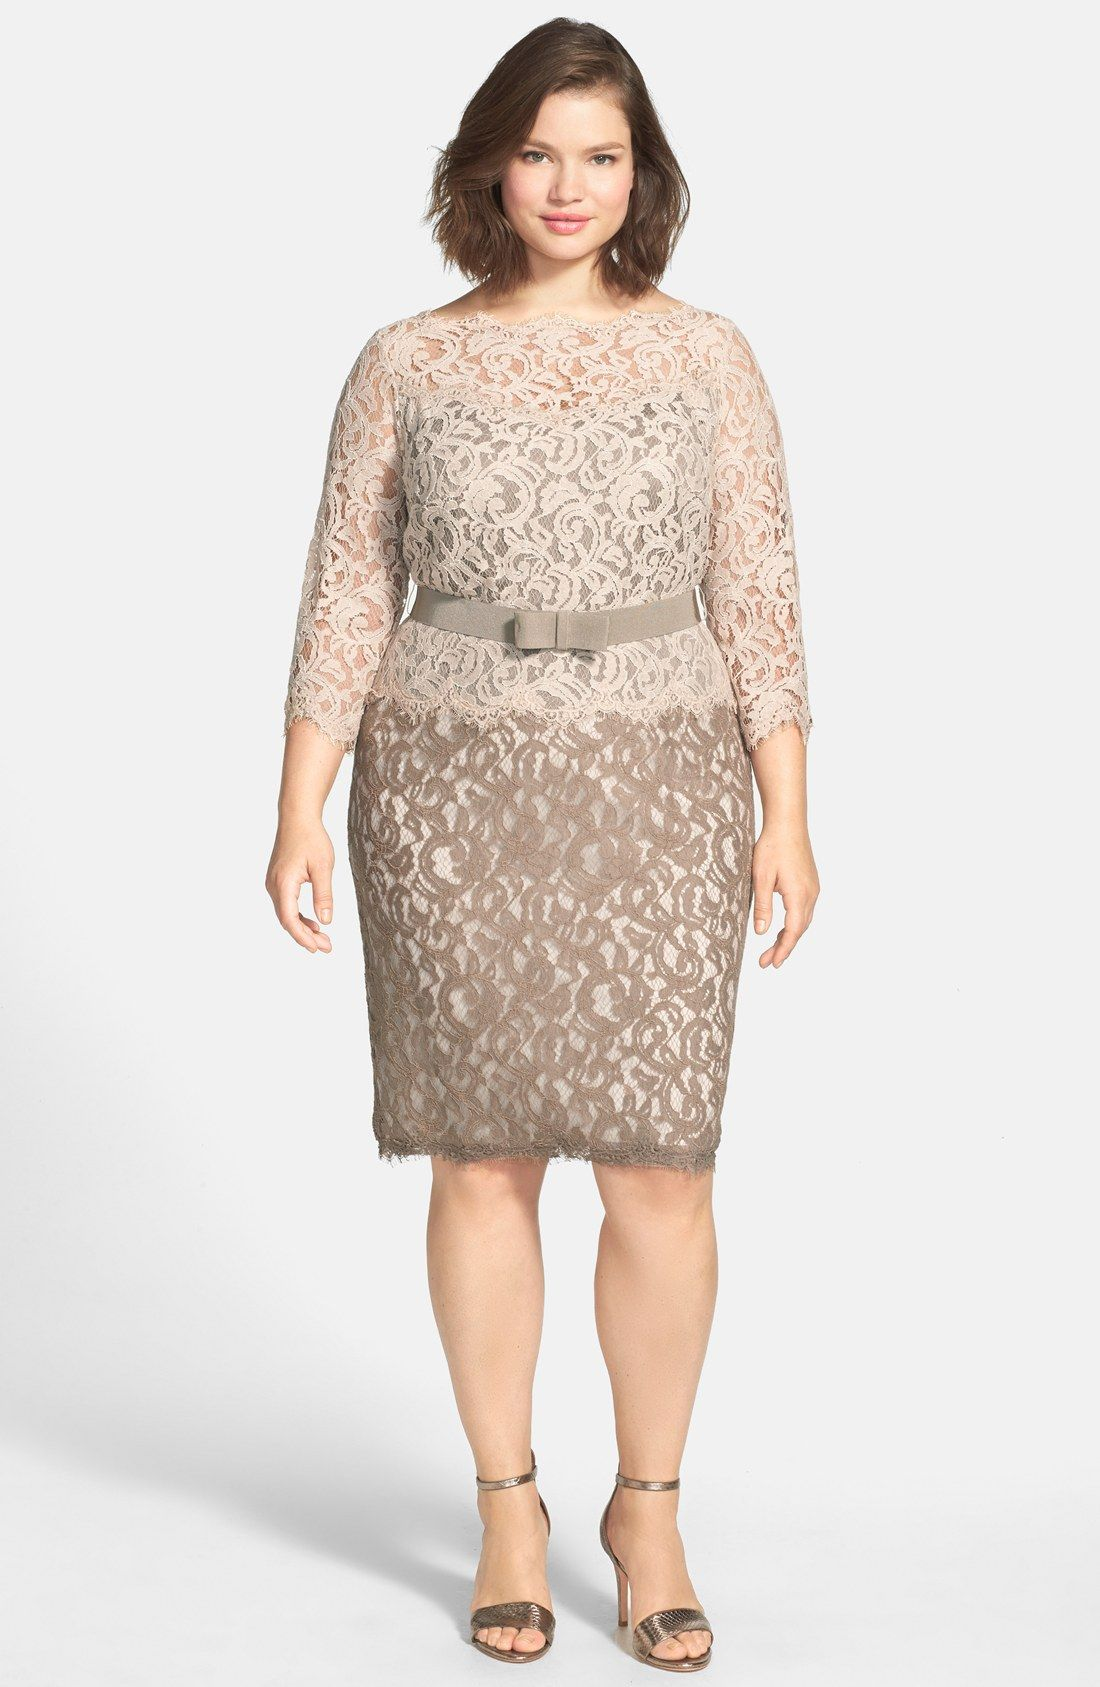 Tadashi Shoji Belted Lace Dress (Plus Size) | Dress skirt ...